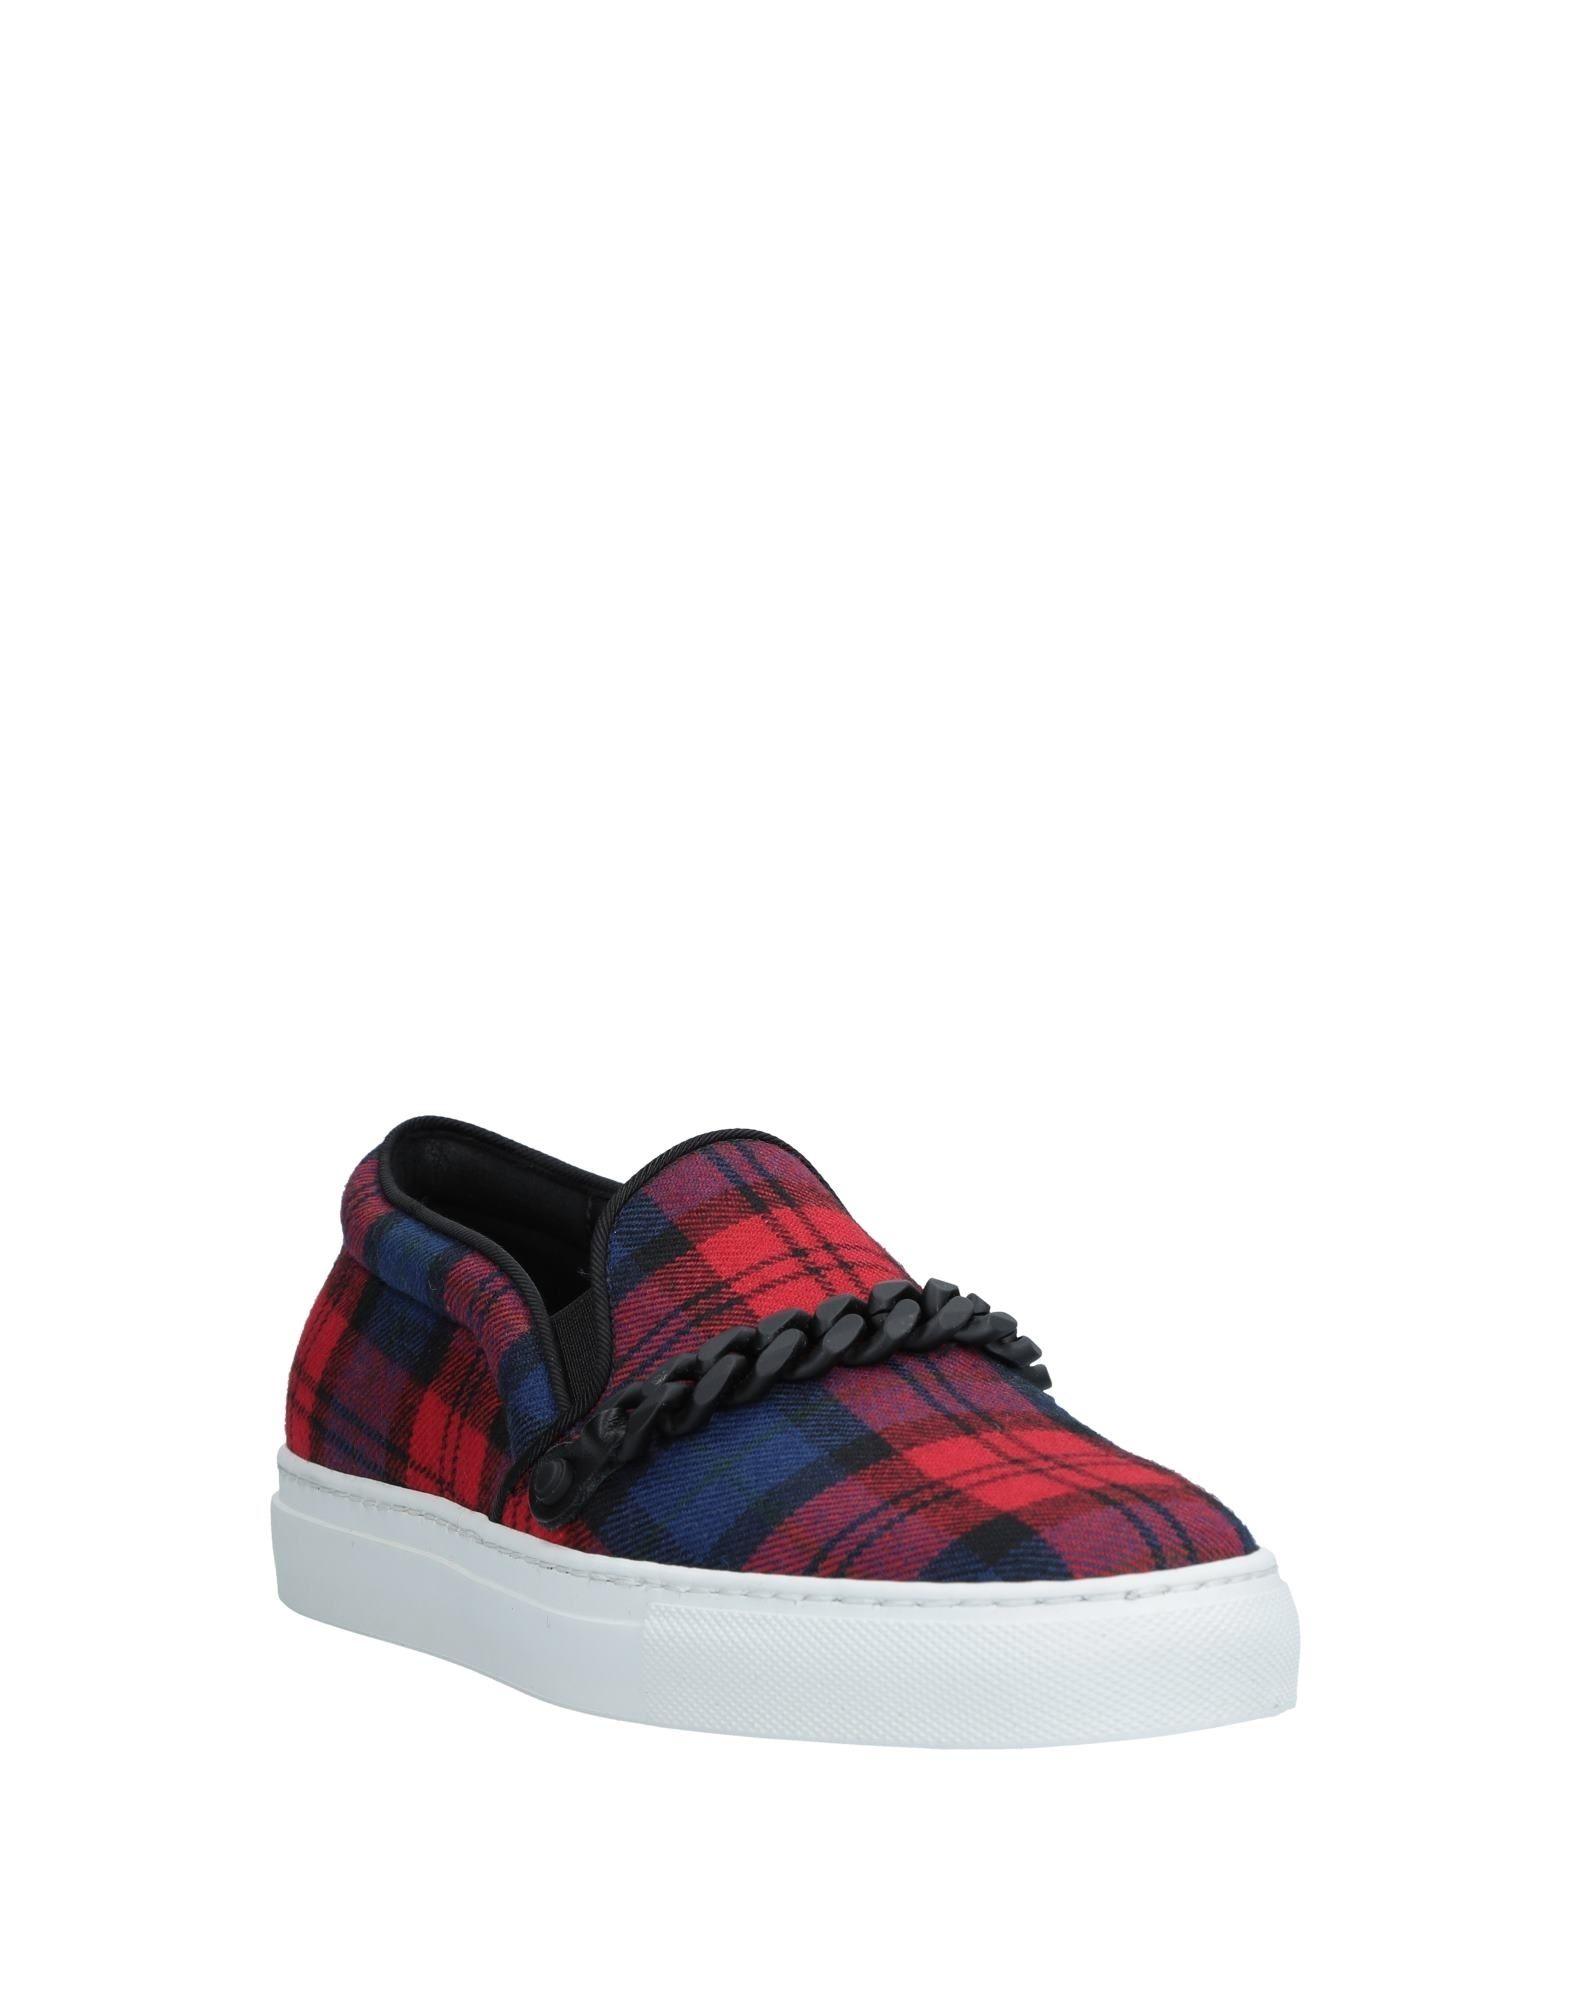 Louis Leeman Sneakers - - - Men Louis Leeman Sneakers online on  Australia - 11542193NJ 508942